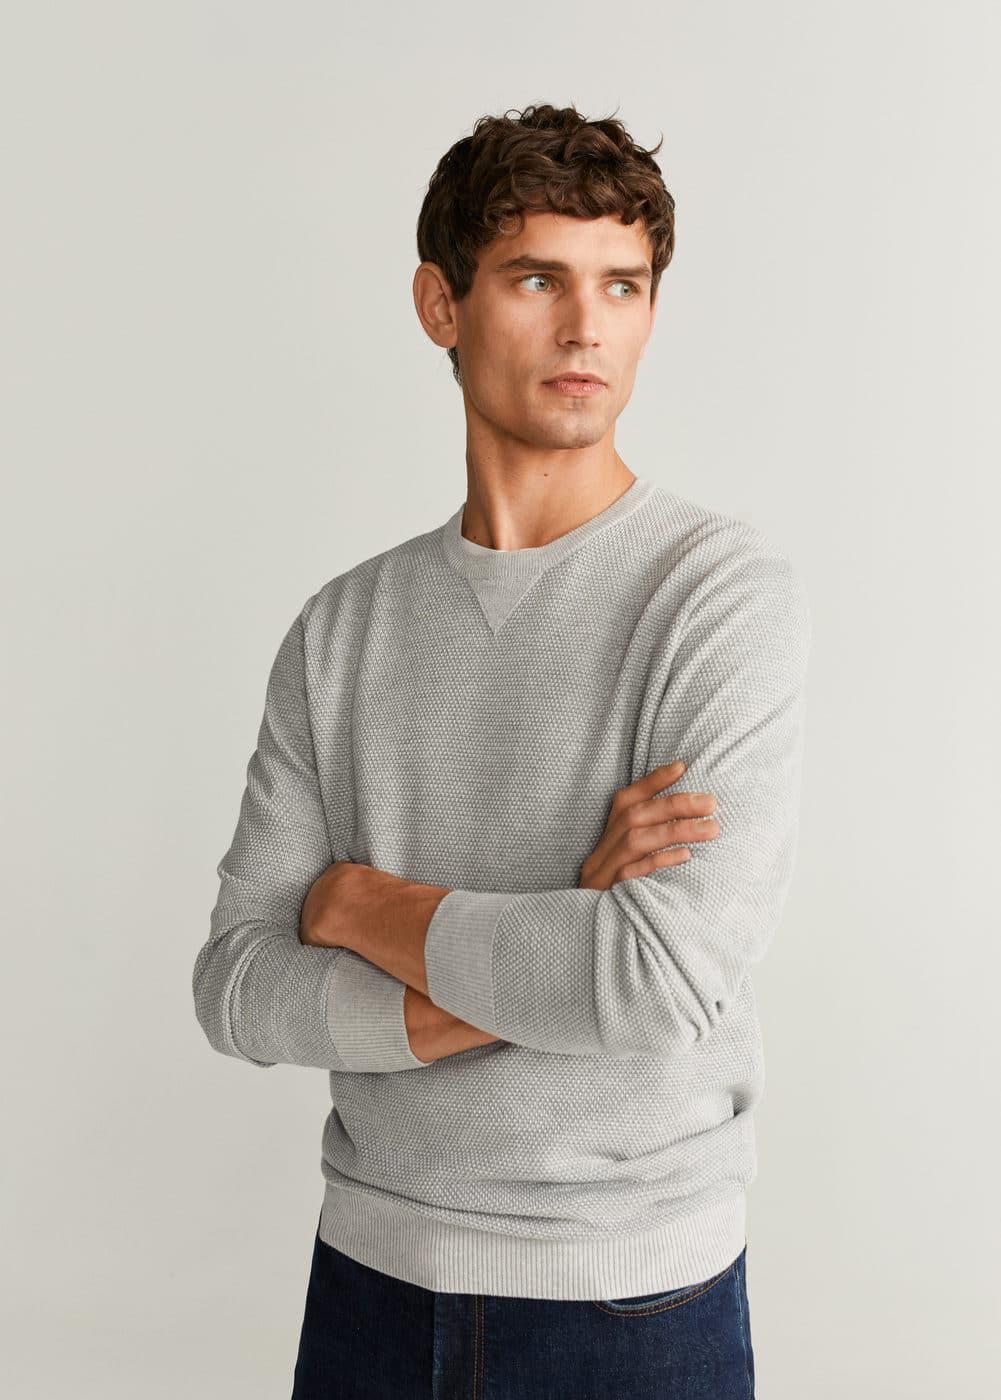 h-antigua:jersey algodon organico estructura